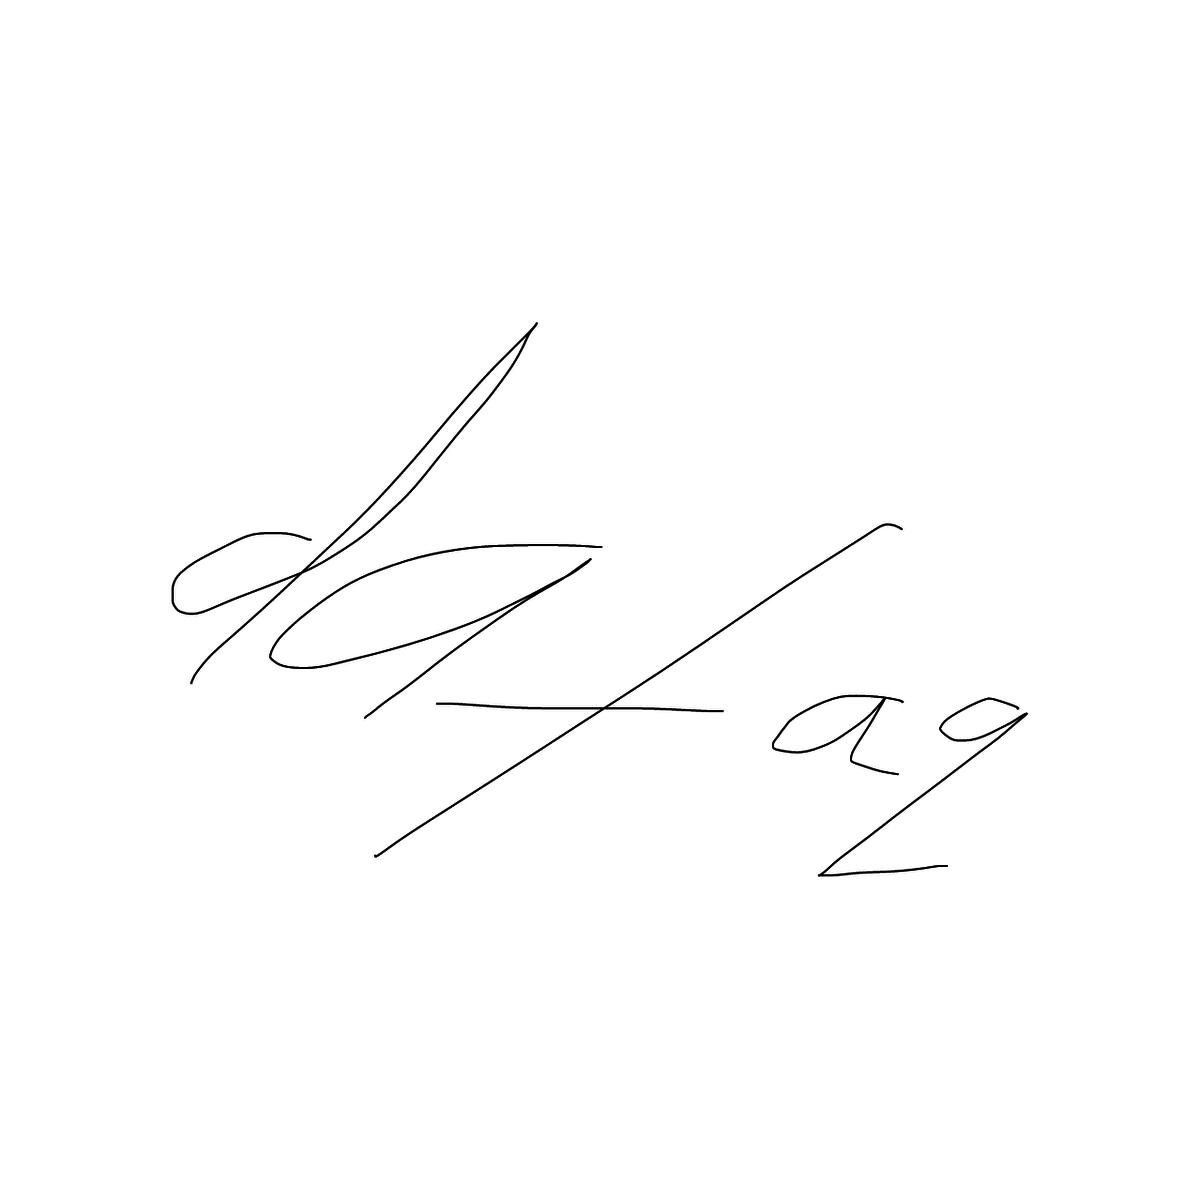 BAAAM drawing#673 lat:-38.1043090820312500lng: 145.6018066406250000